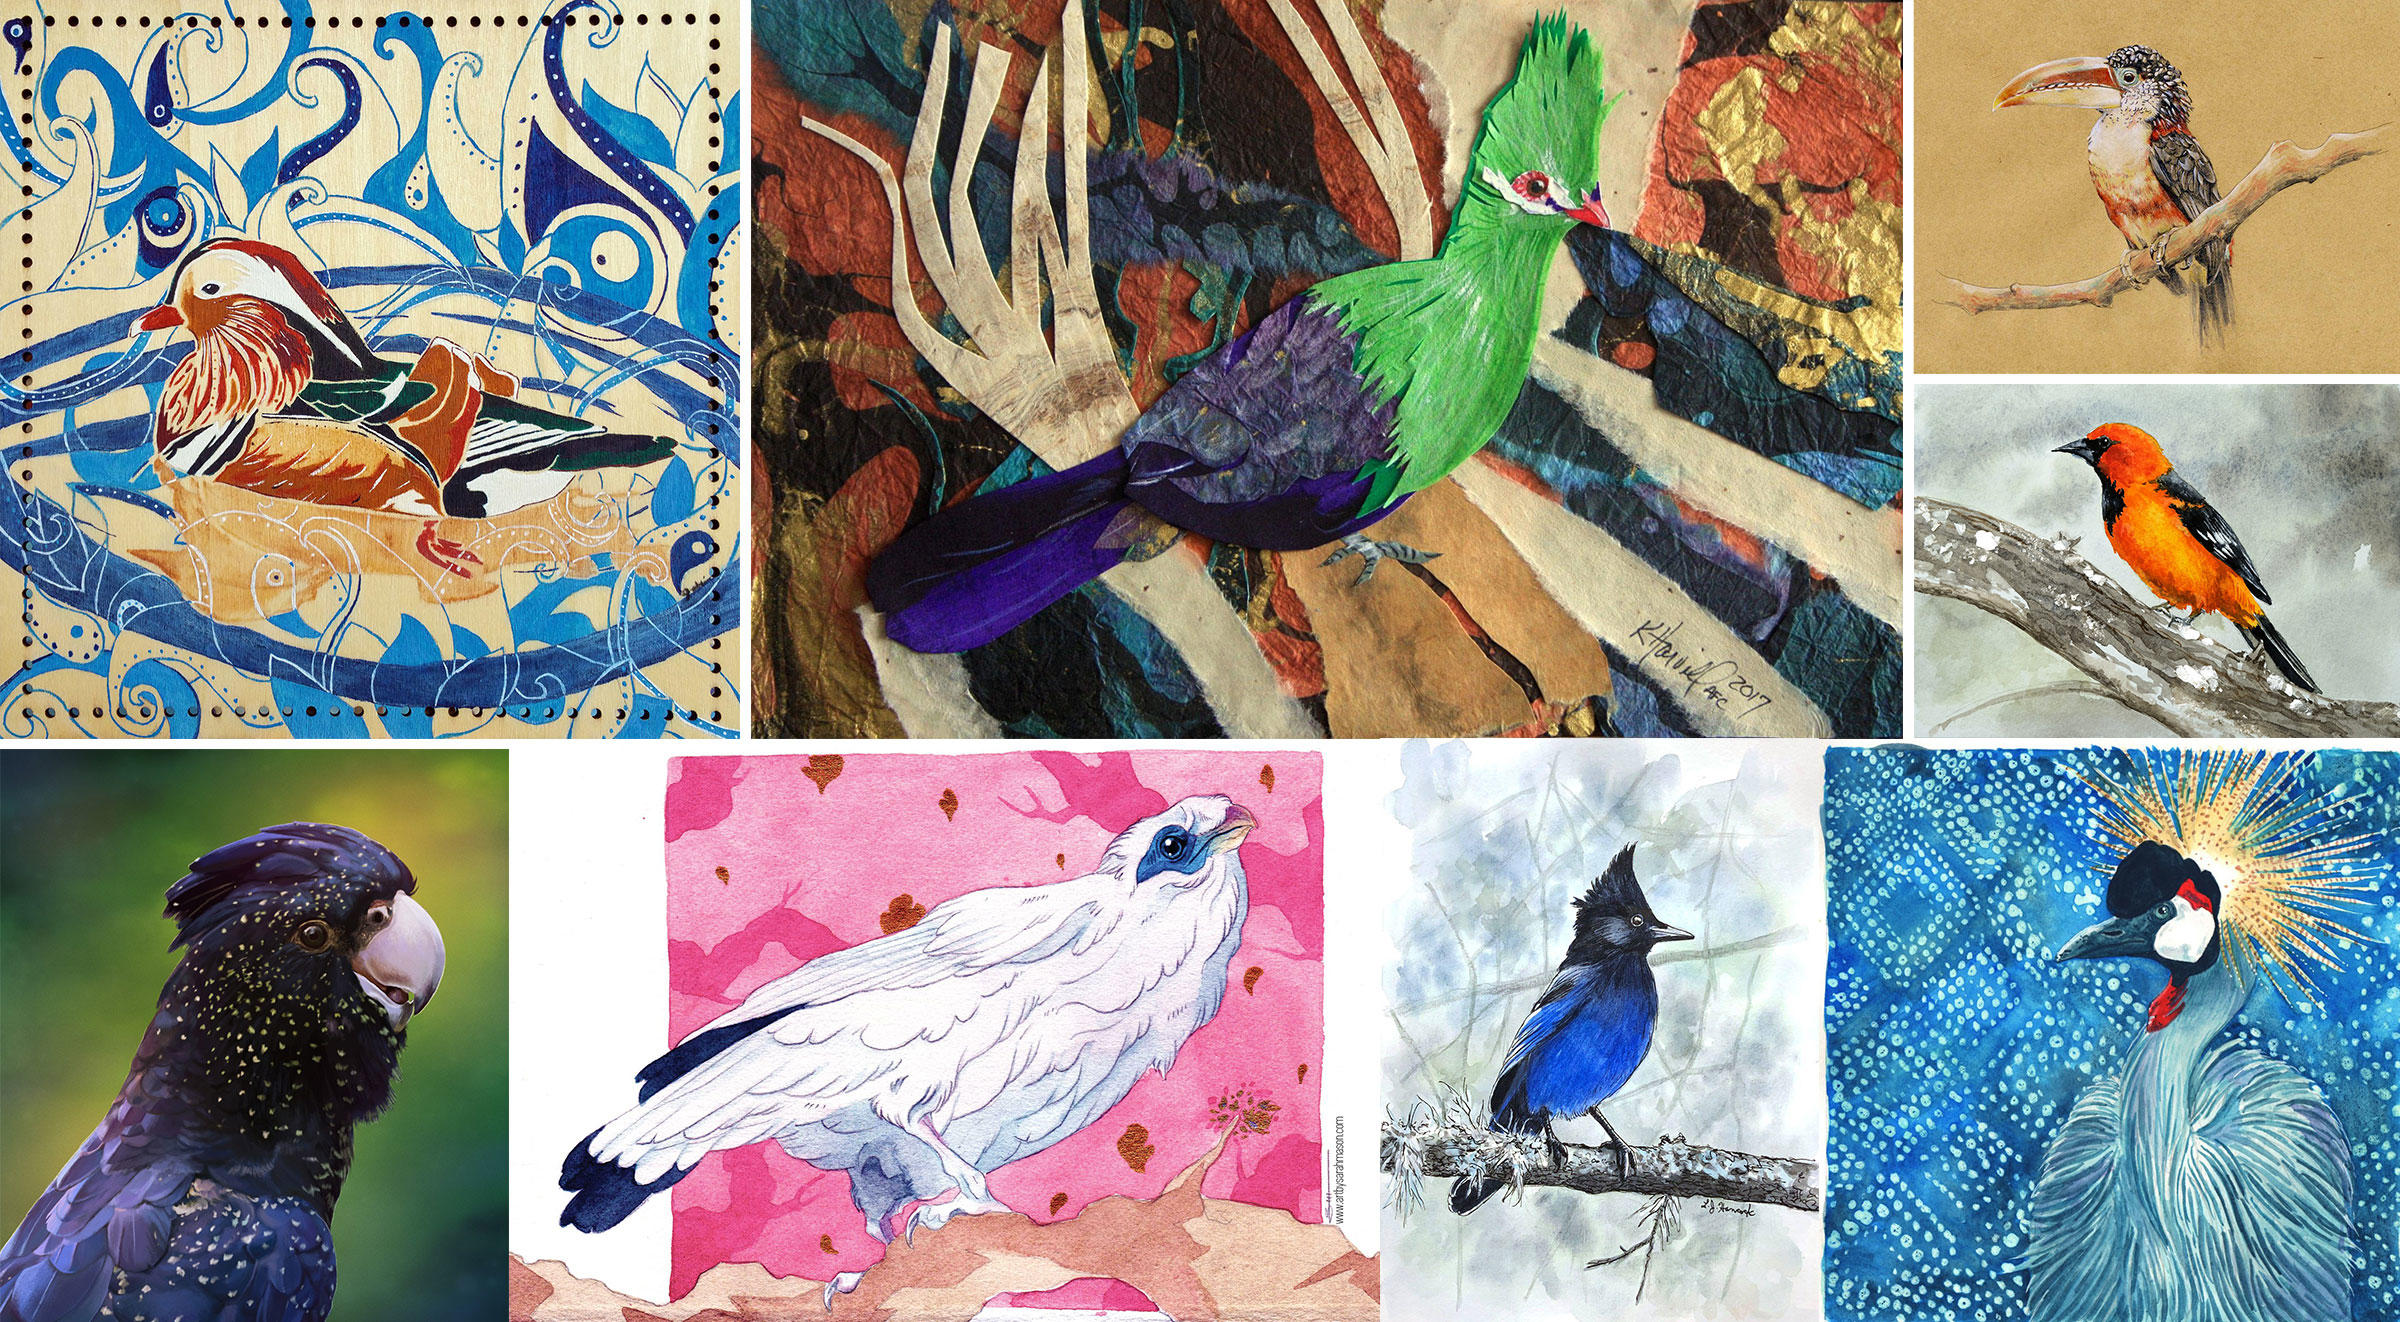 Illustrations clockwise from top left: Janin Wise; Kitty Harvill; Mia Crow; Amy Nagi; Kat G. Birmelin; Lisa Johnston Hancock; Sarah Mason; Megan Russell